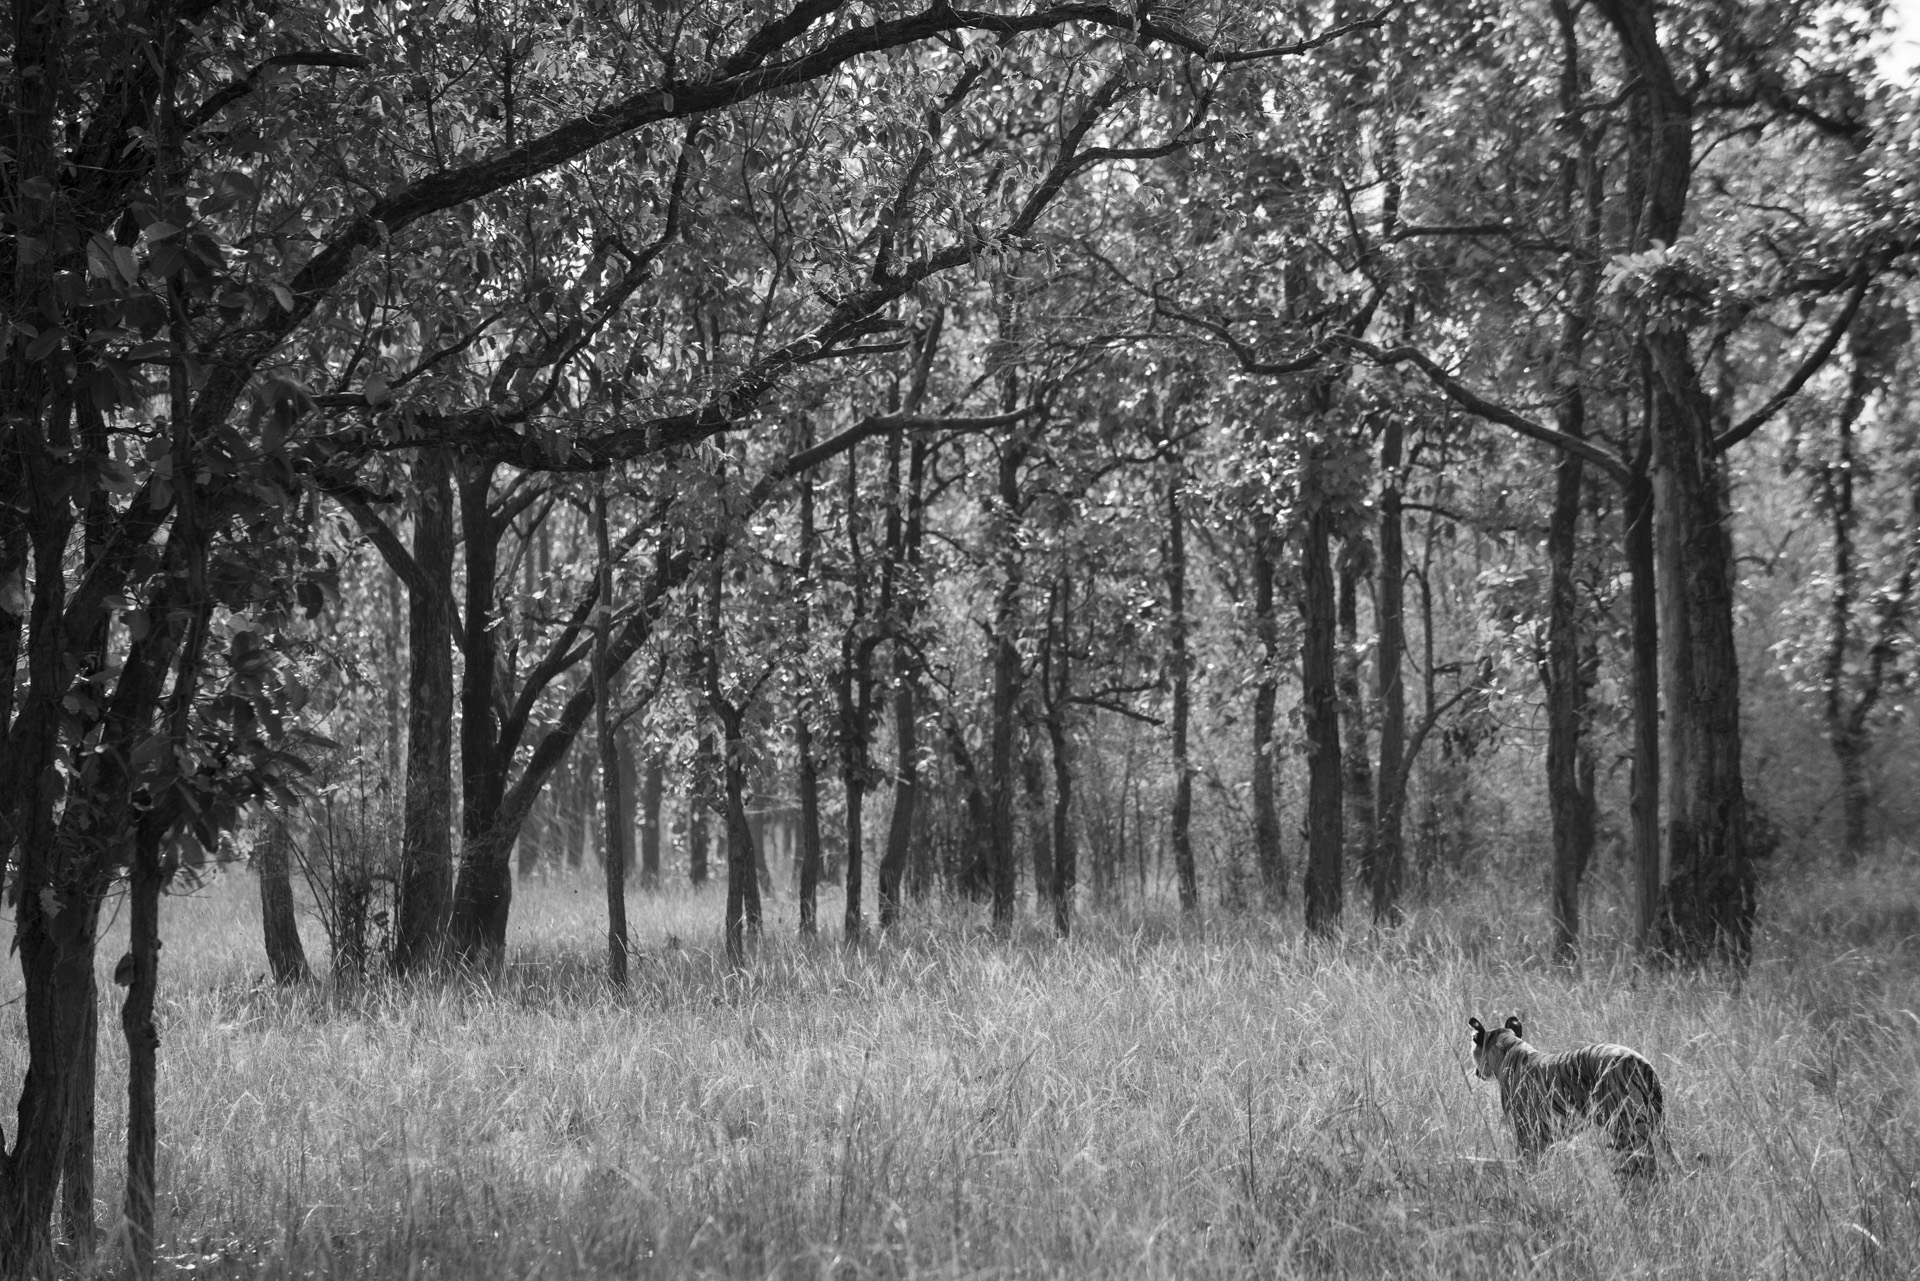 Bengal tigress in sal forest, Bandhavgarh National Park, Madhya Pradesh, India